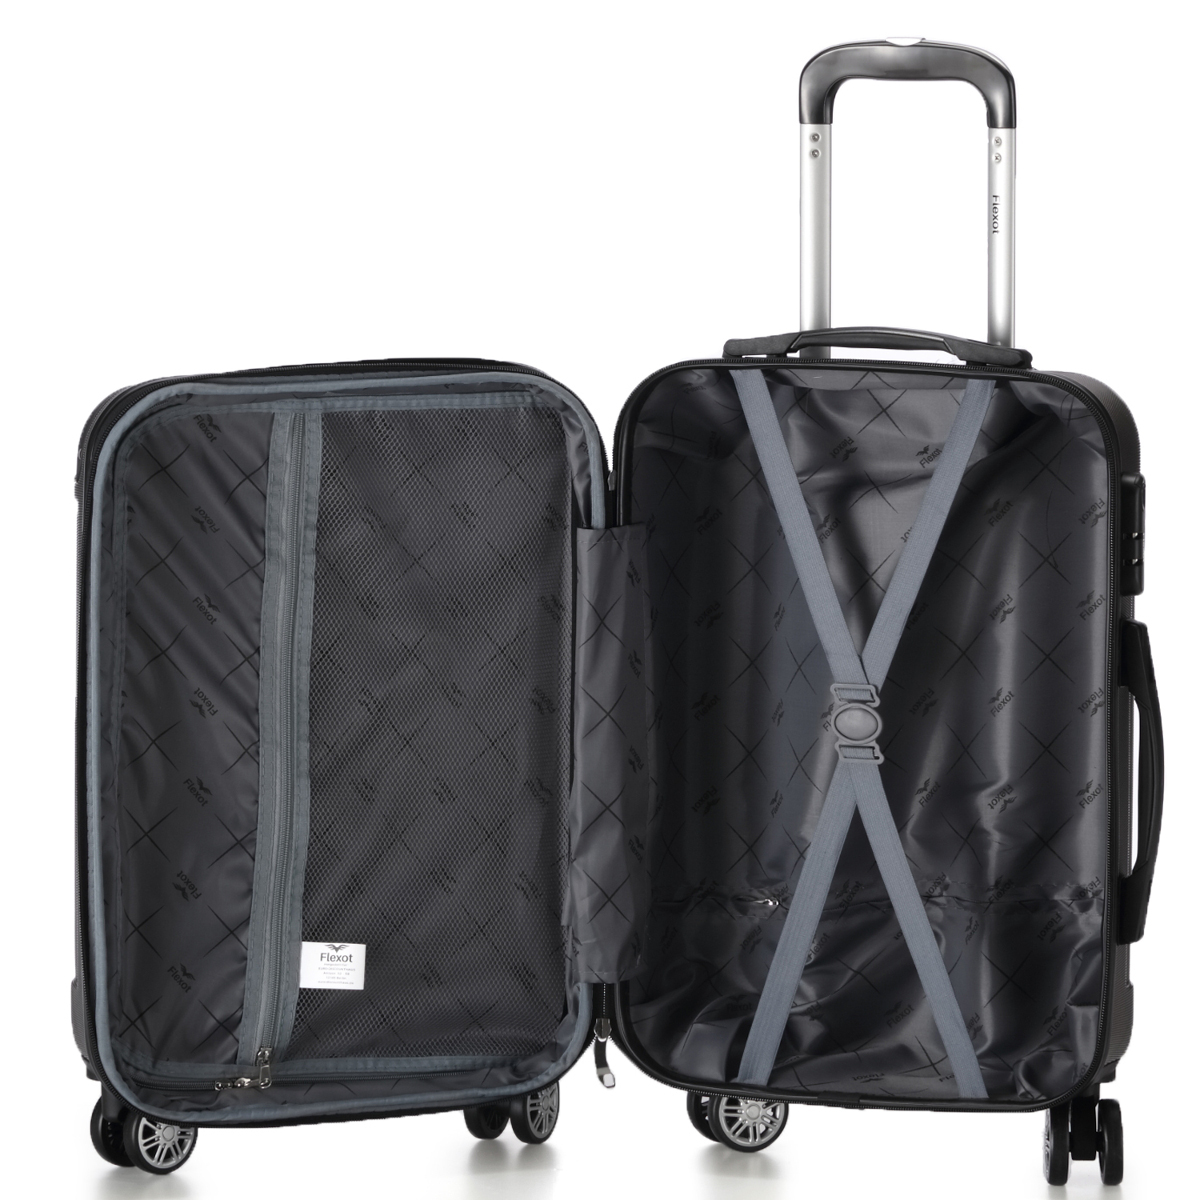 Koffer-Flexot-2045-Hartschalenkoffer-Trolley-Kofferset-Reisekoffer-M-L-XL-Set Indexbild 68